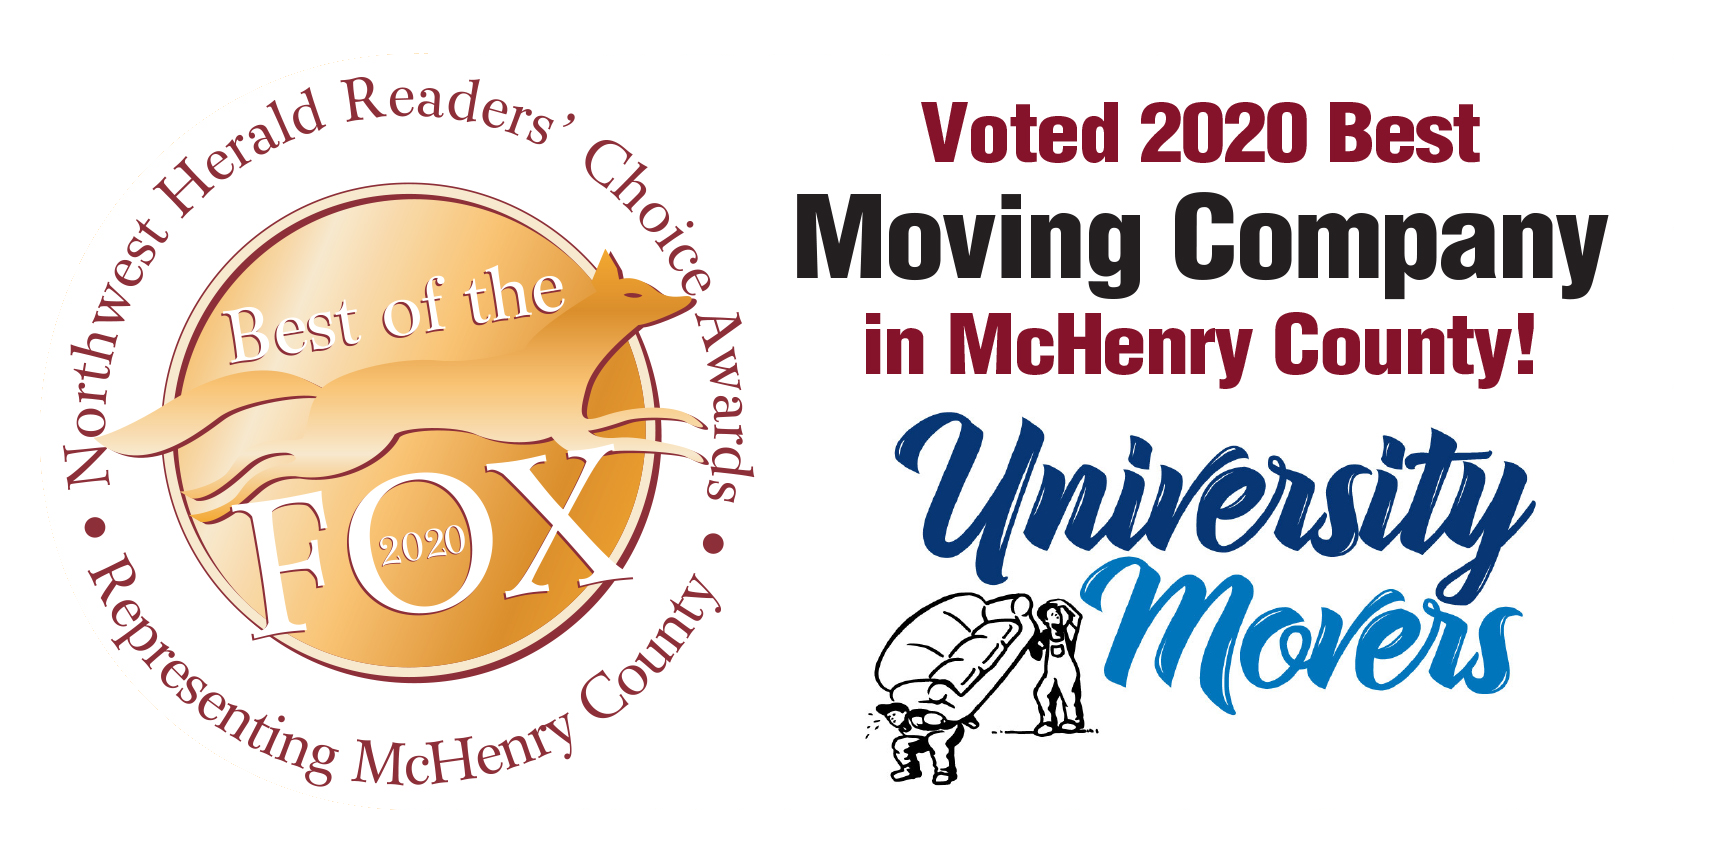 University Movers - Best of the Fox 2020 (BIG)